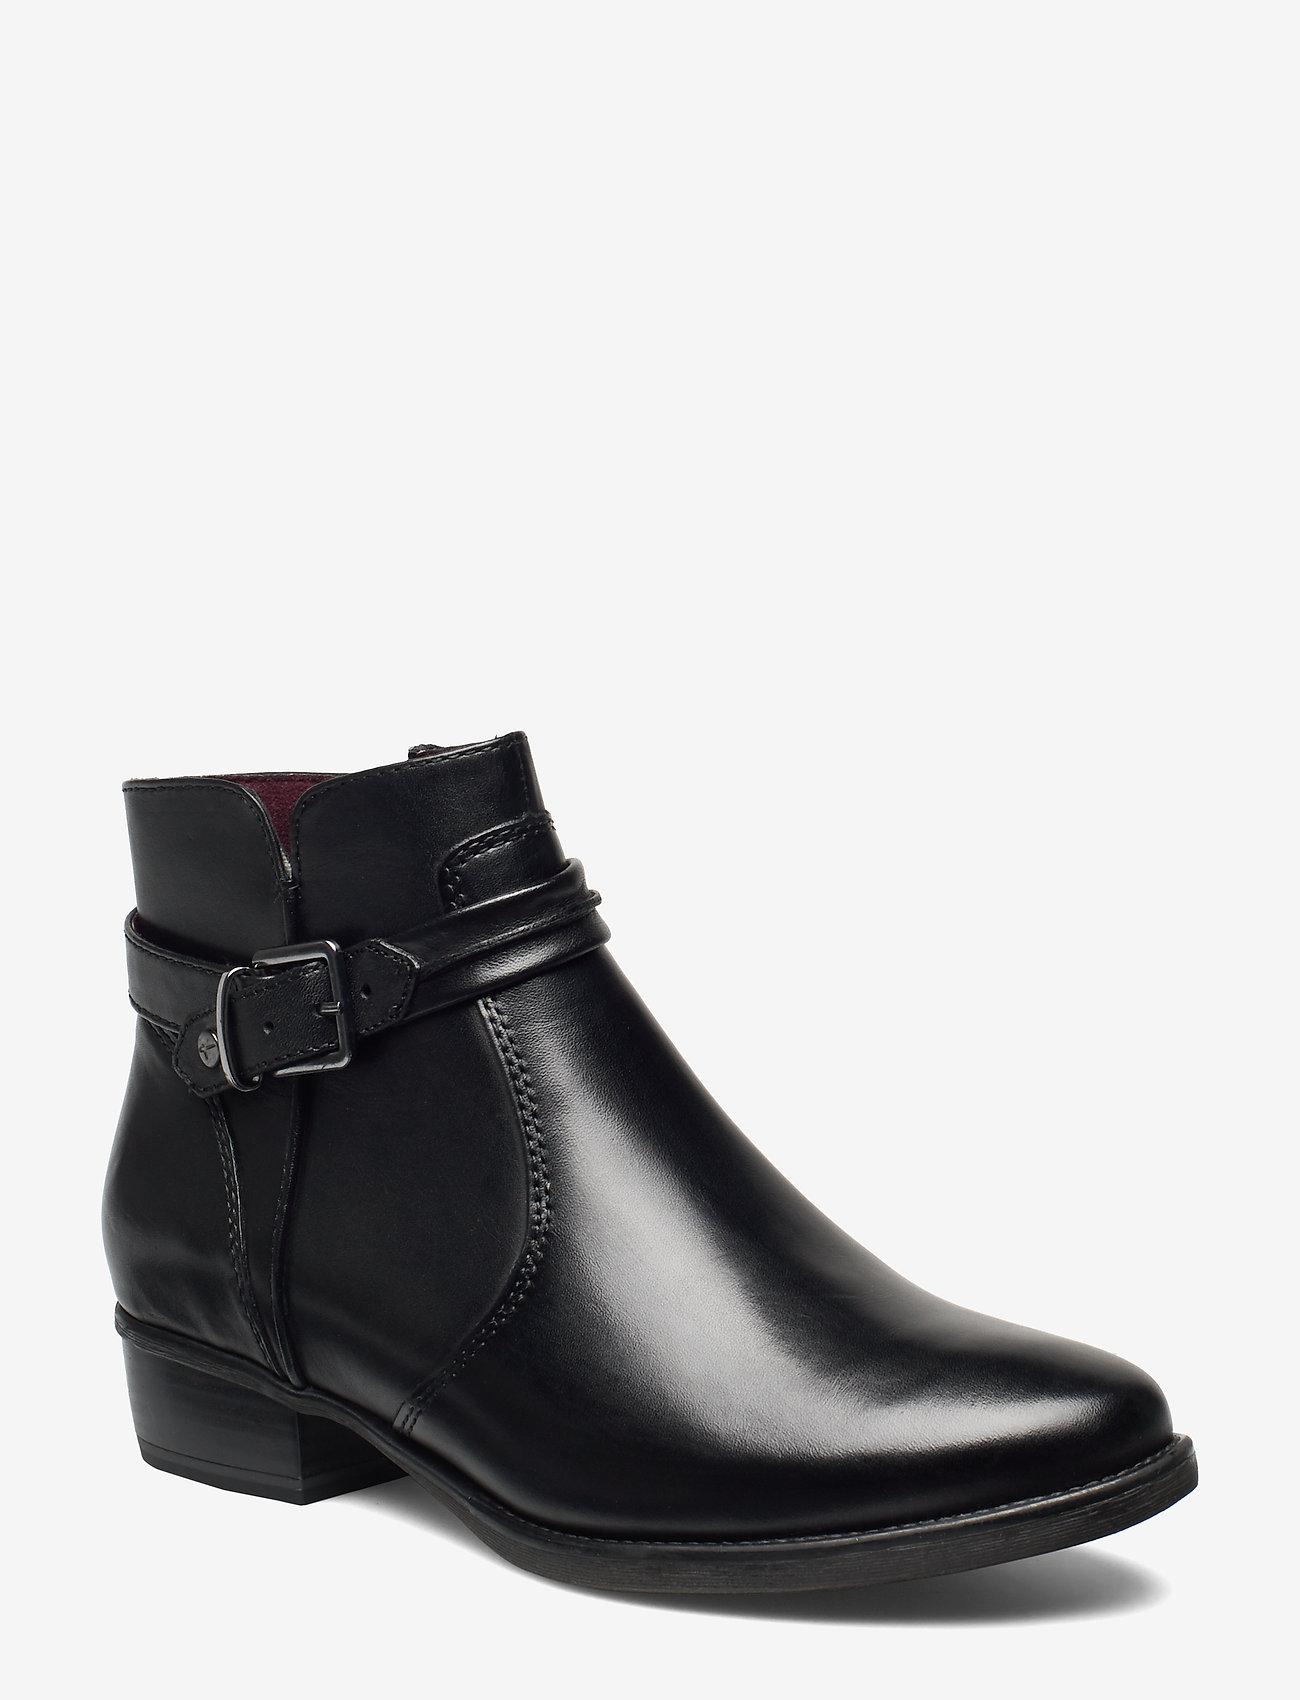 Tamaris - Boots - platta ankelboots - black - 0